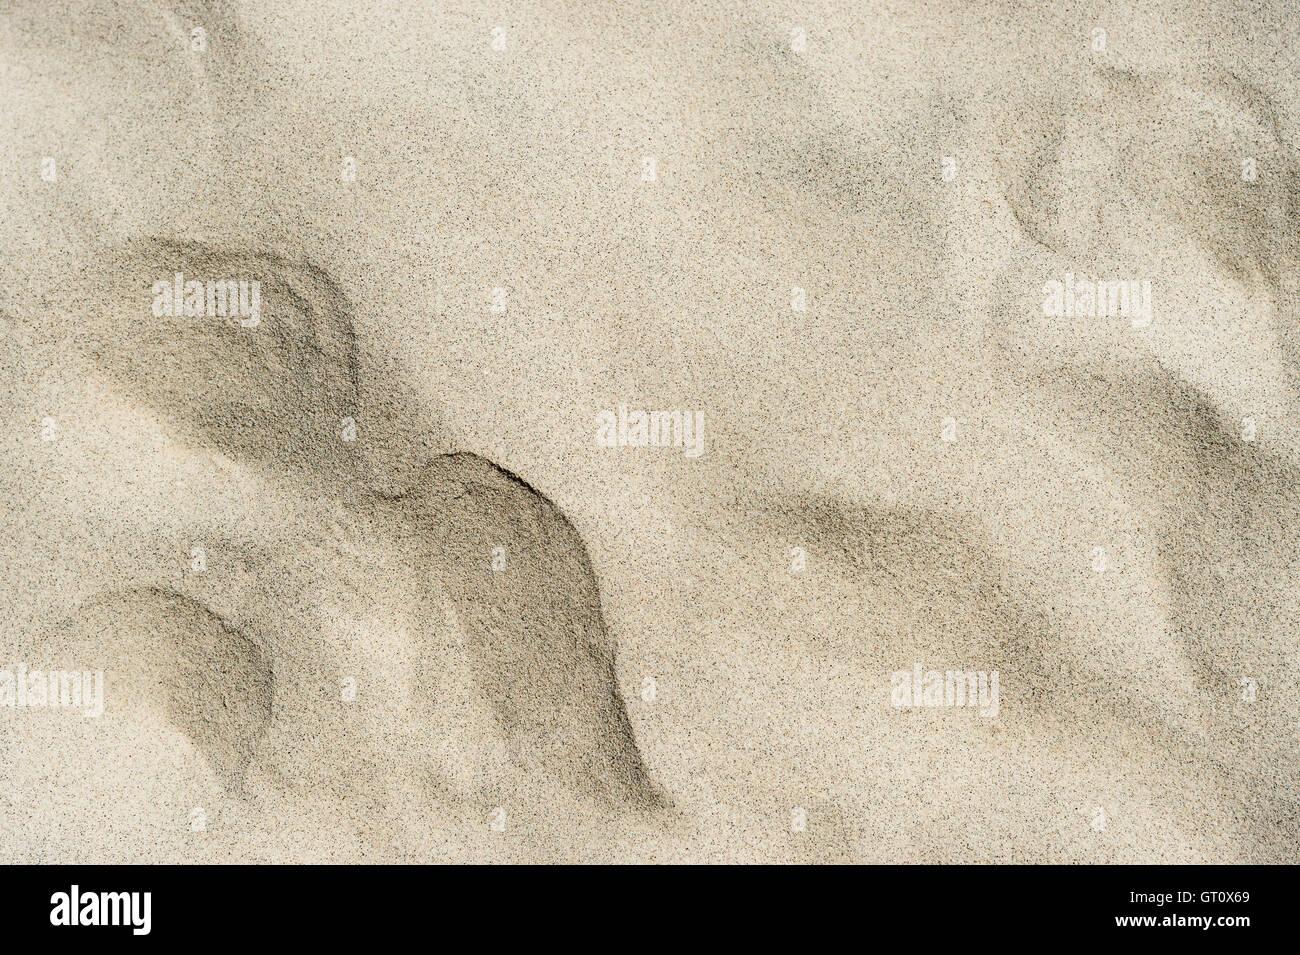 sand texture on beach - Stock Image